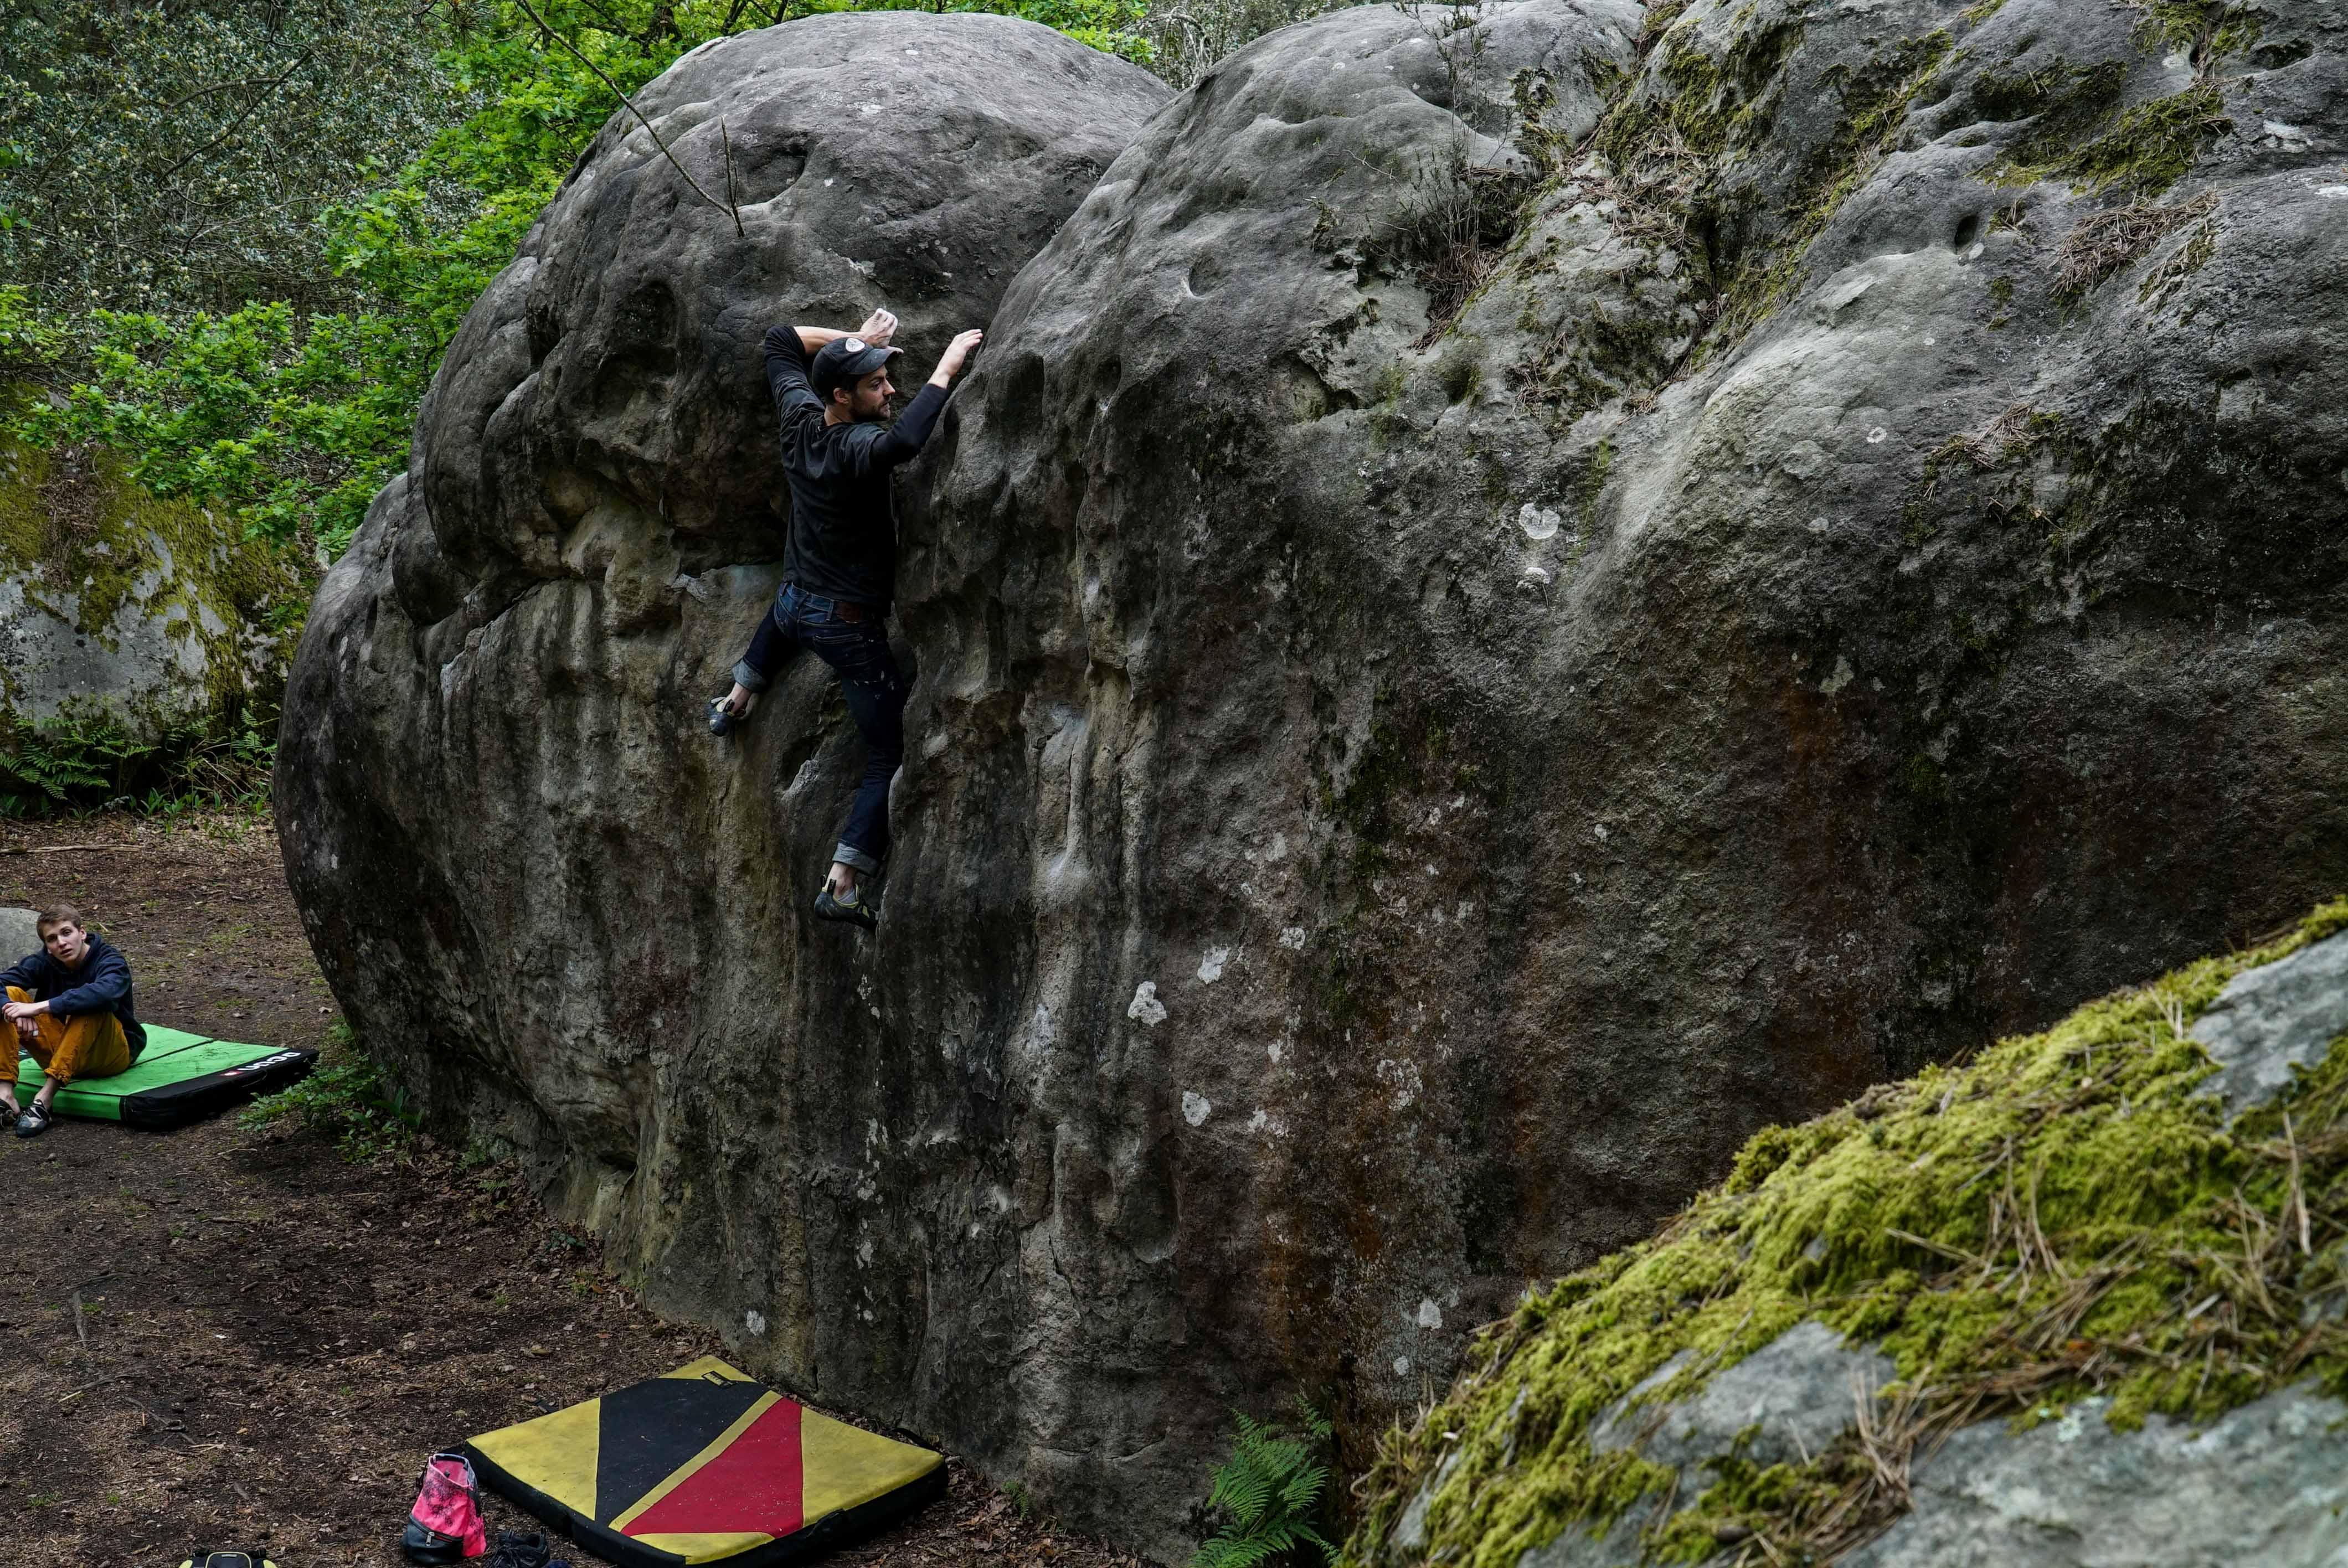 fontainbleau climbing 2016 mike brindley-121